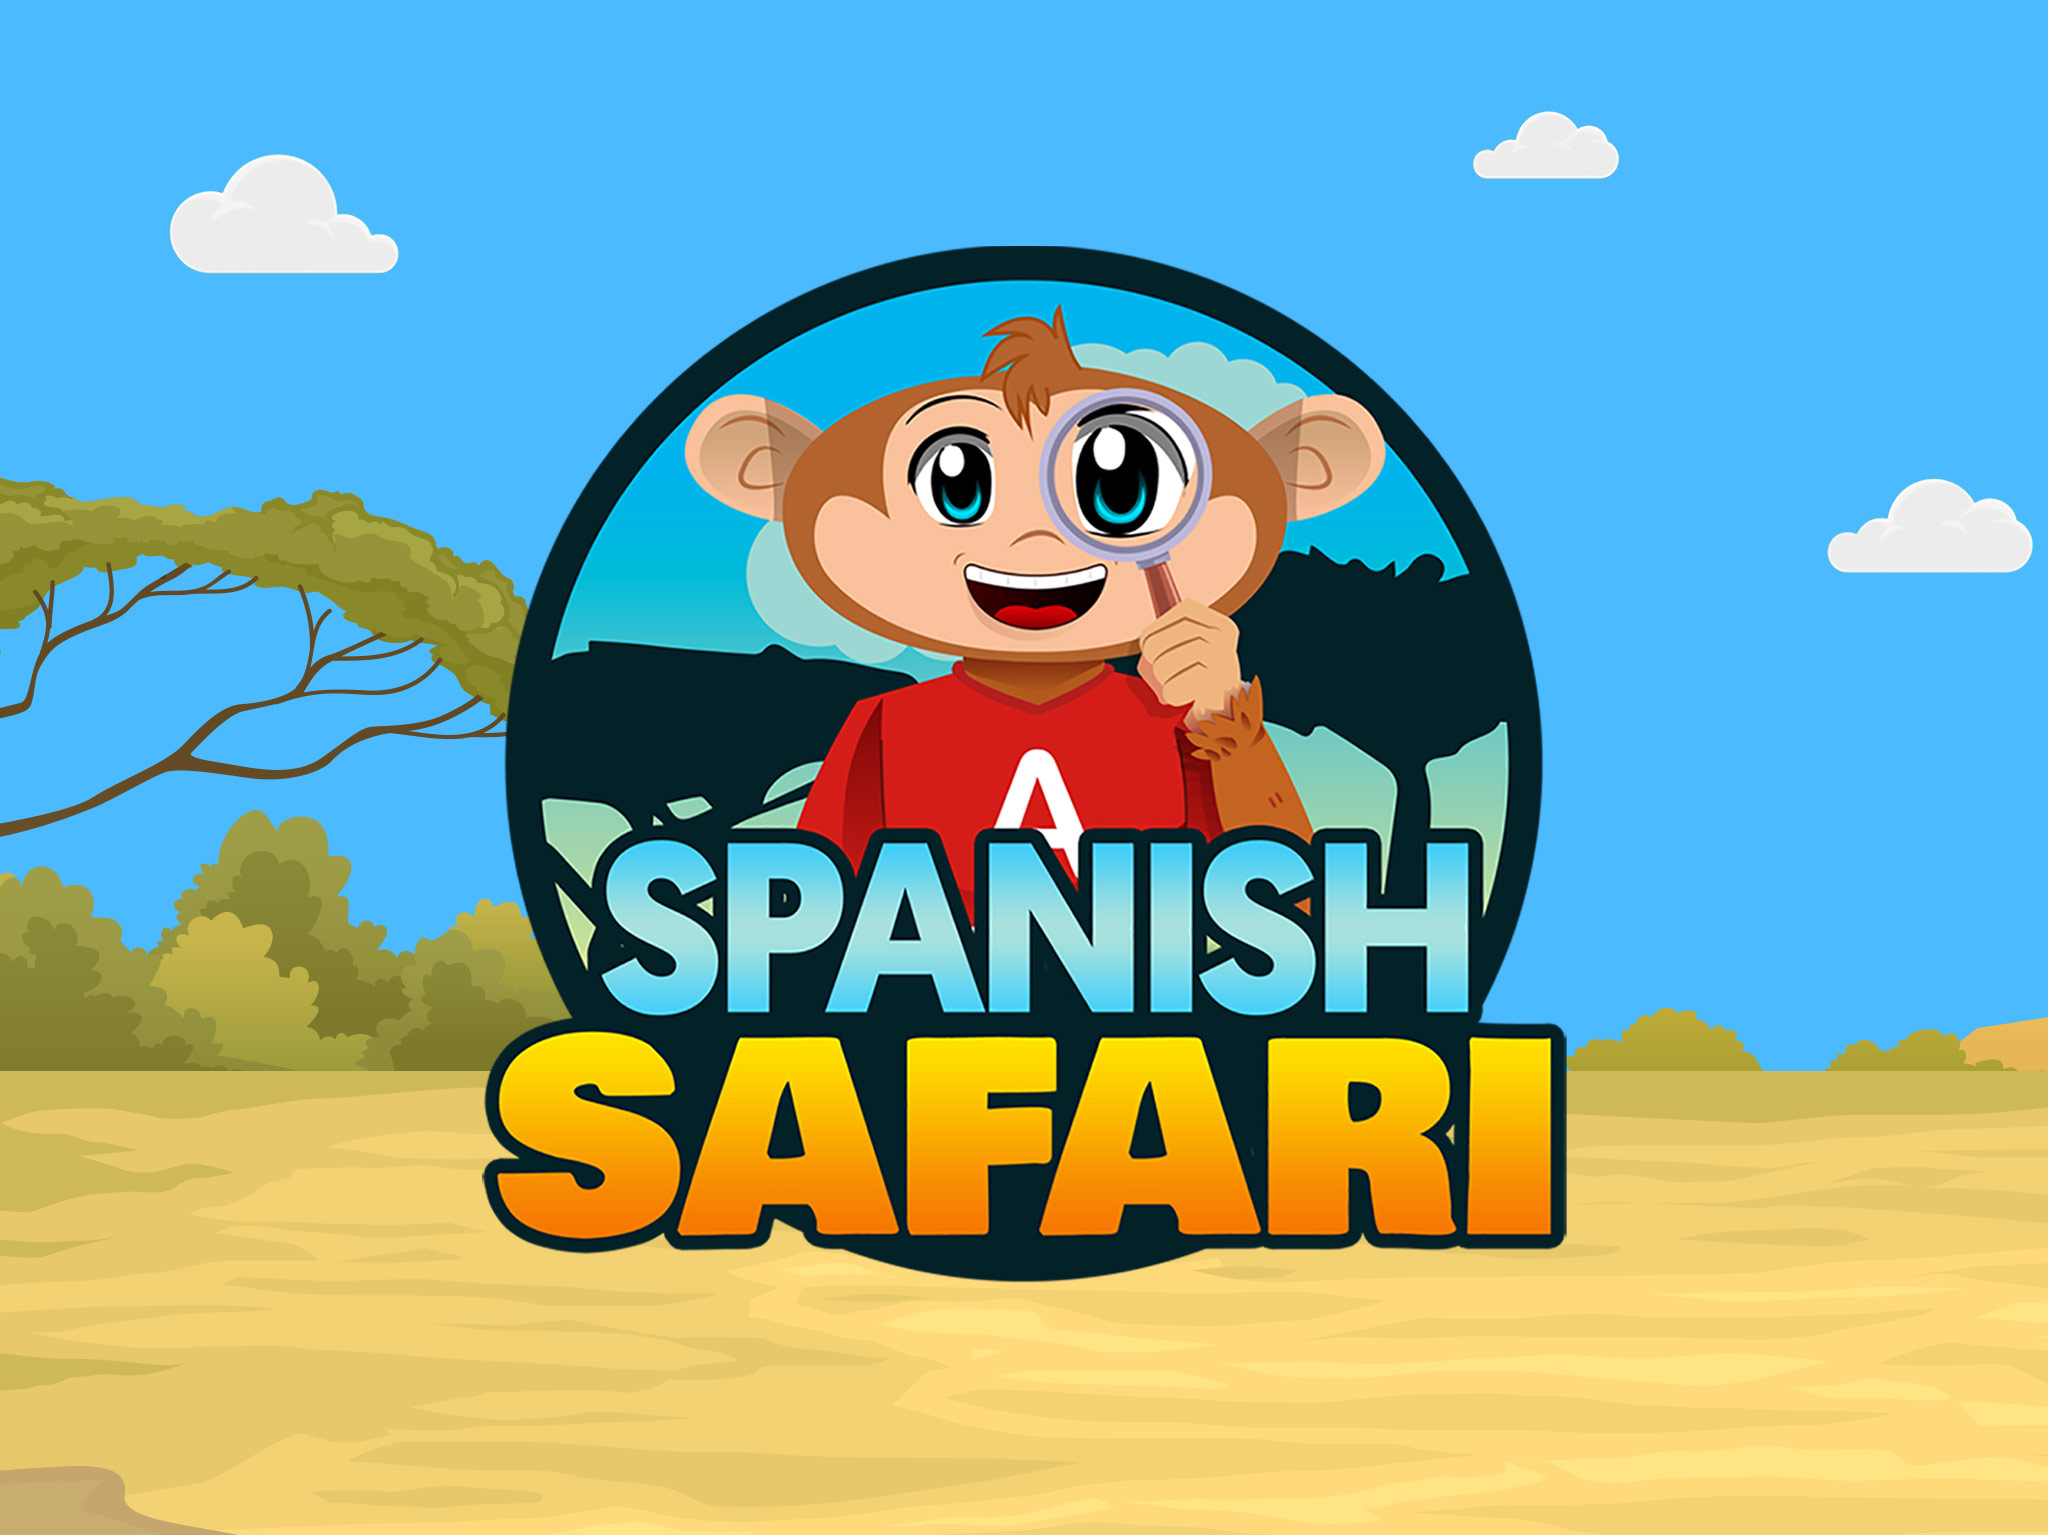 spanish-safari-cover.jpg